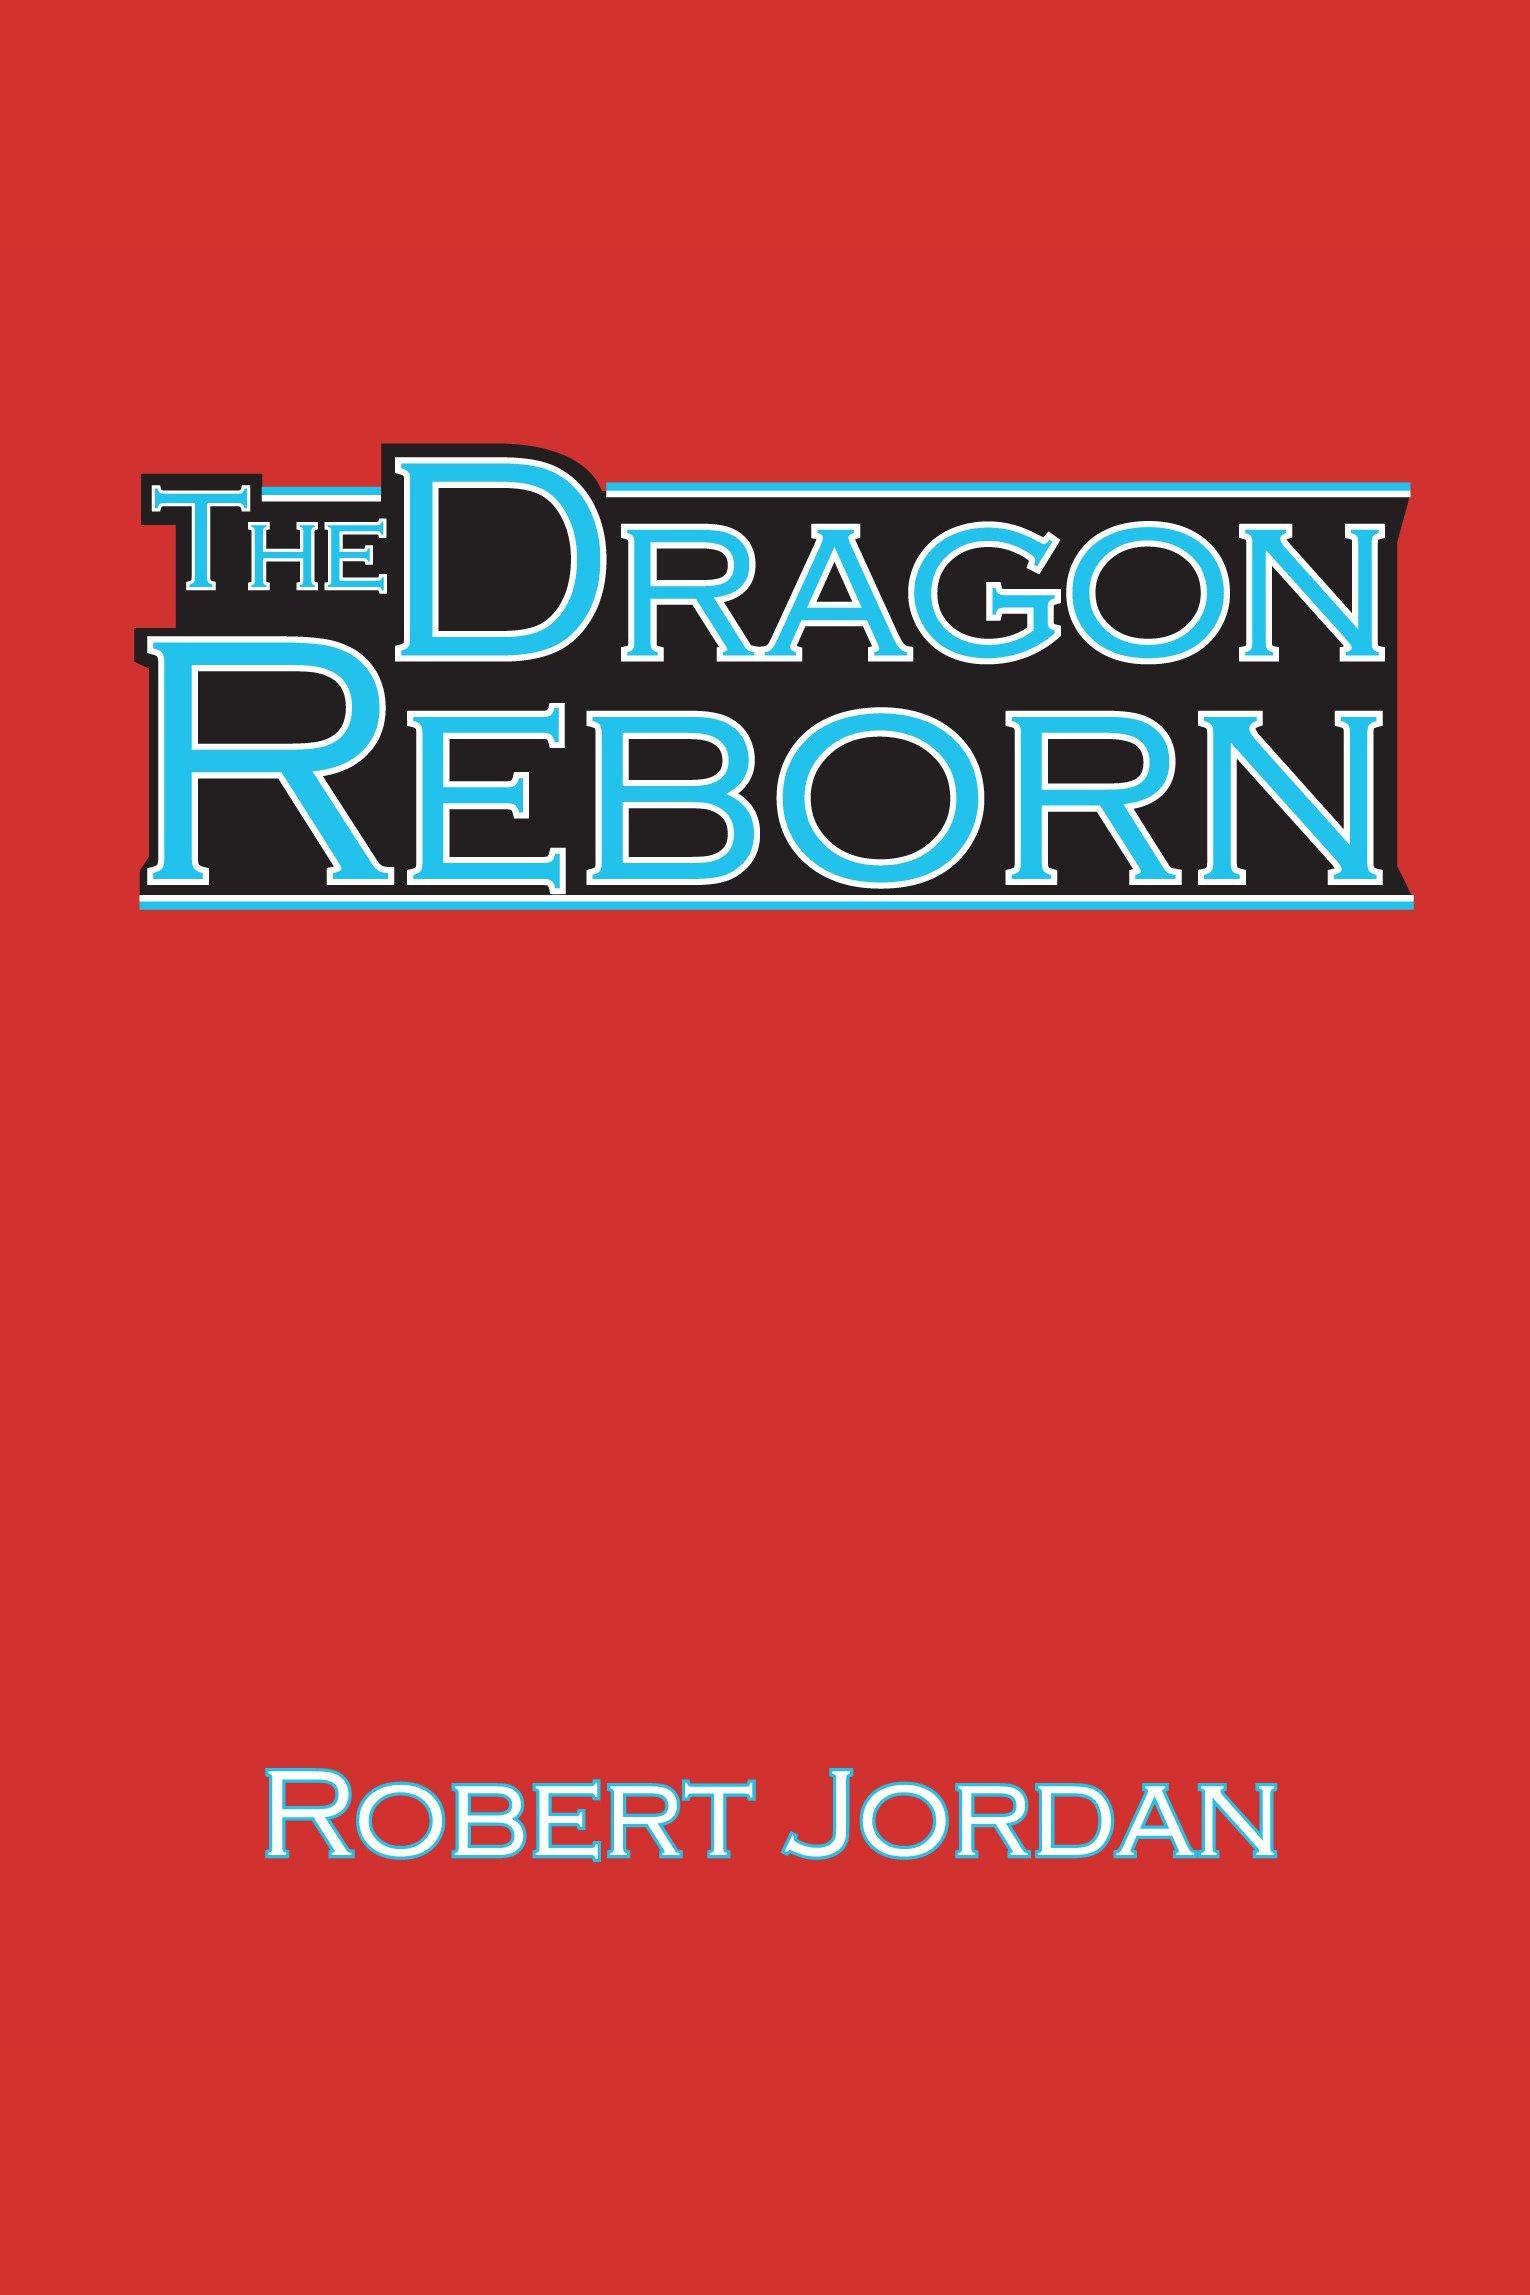 The dragon reborn cover image